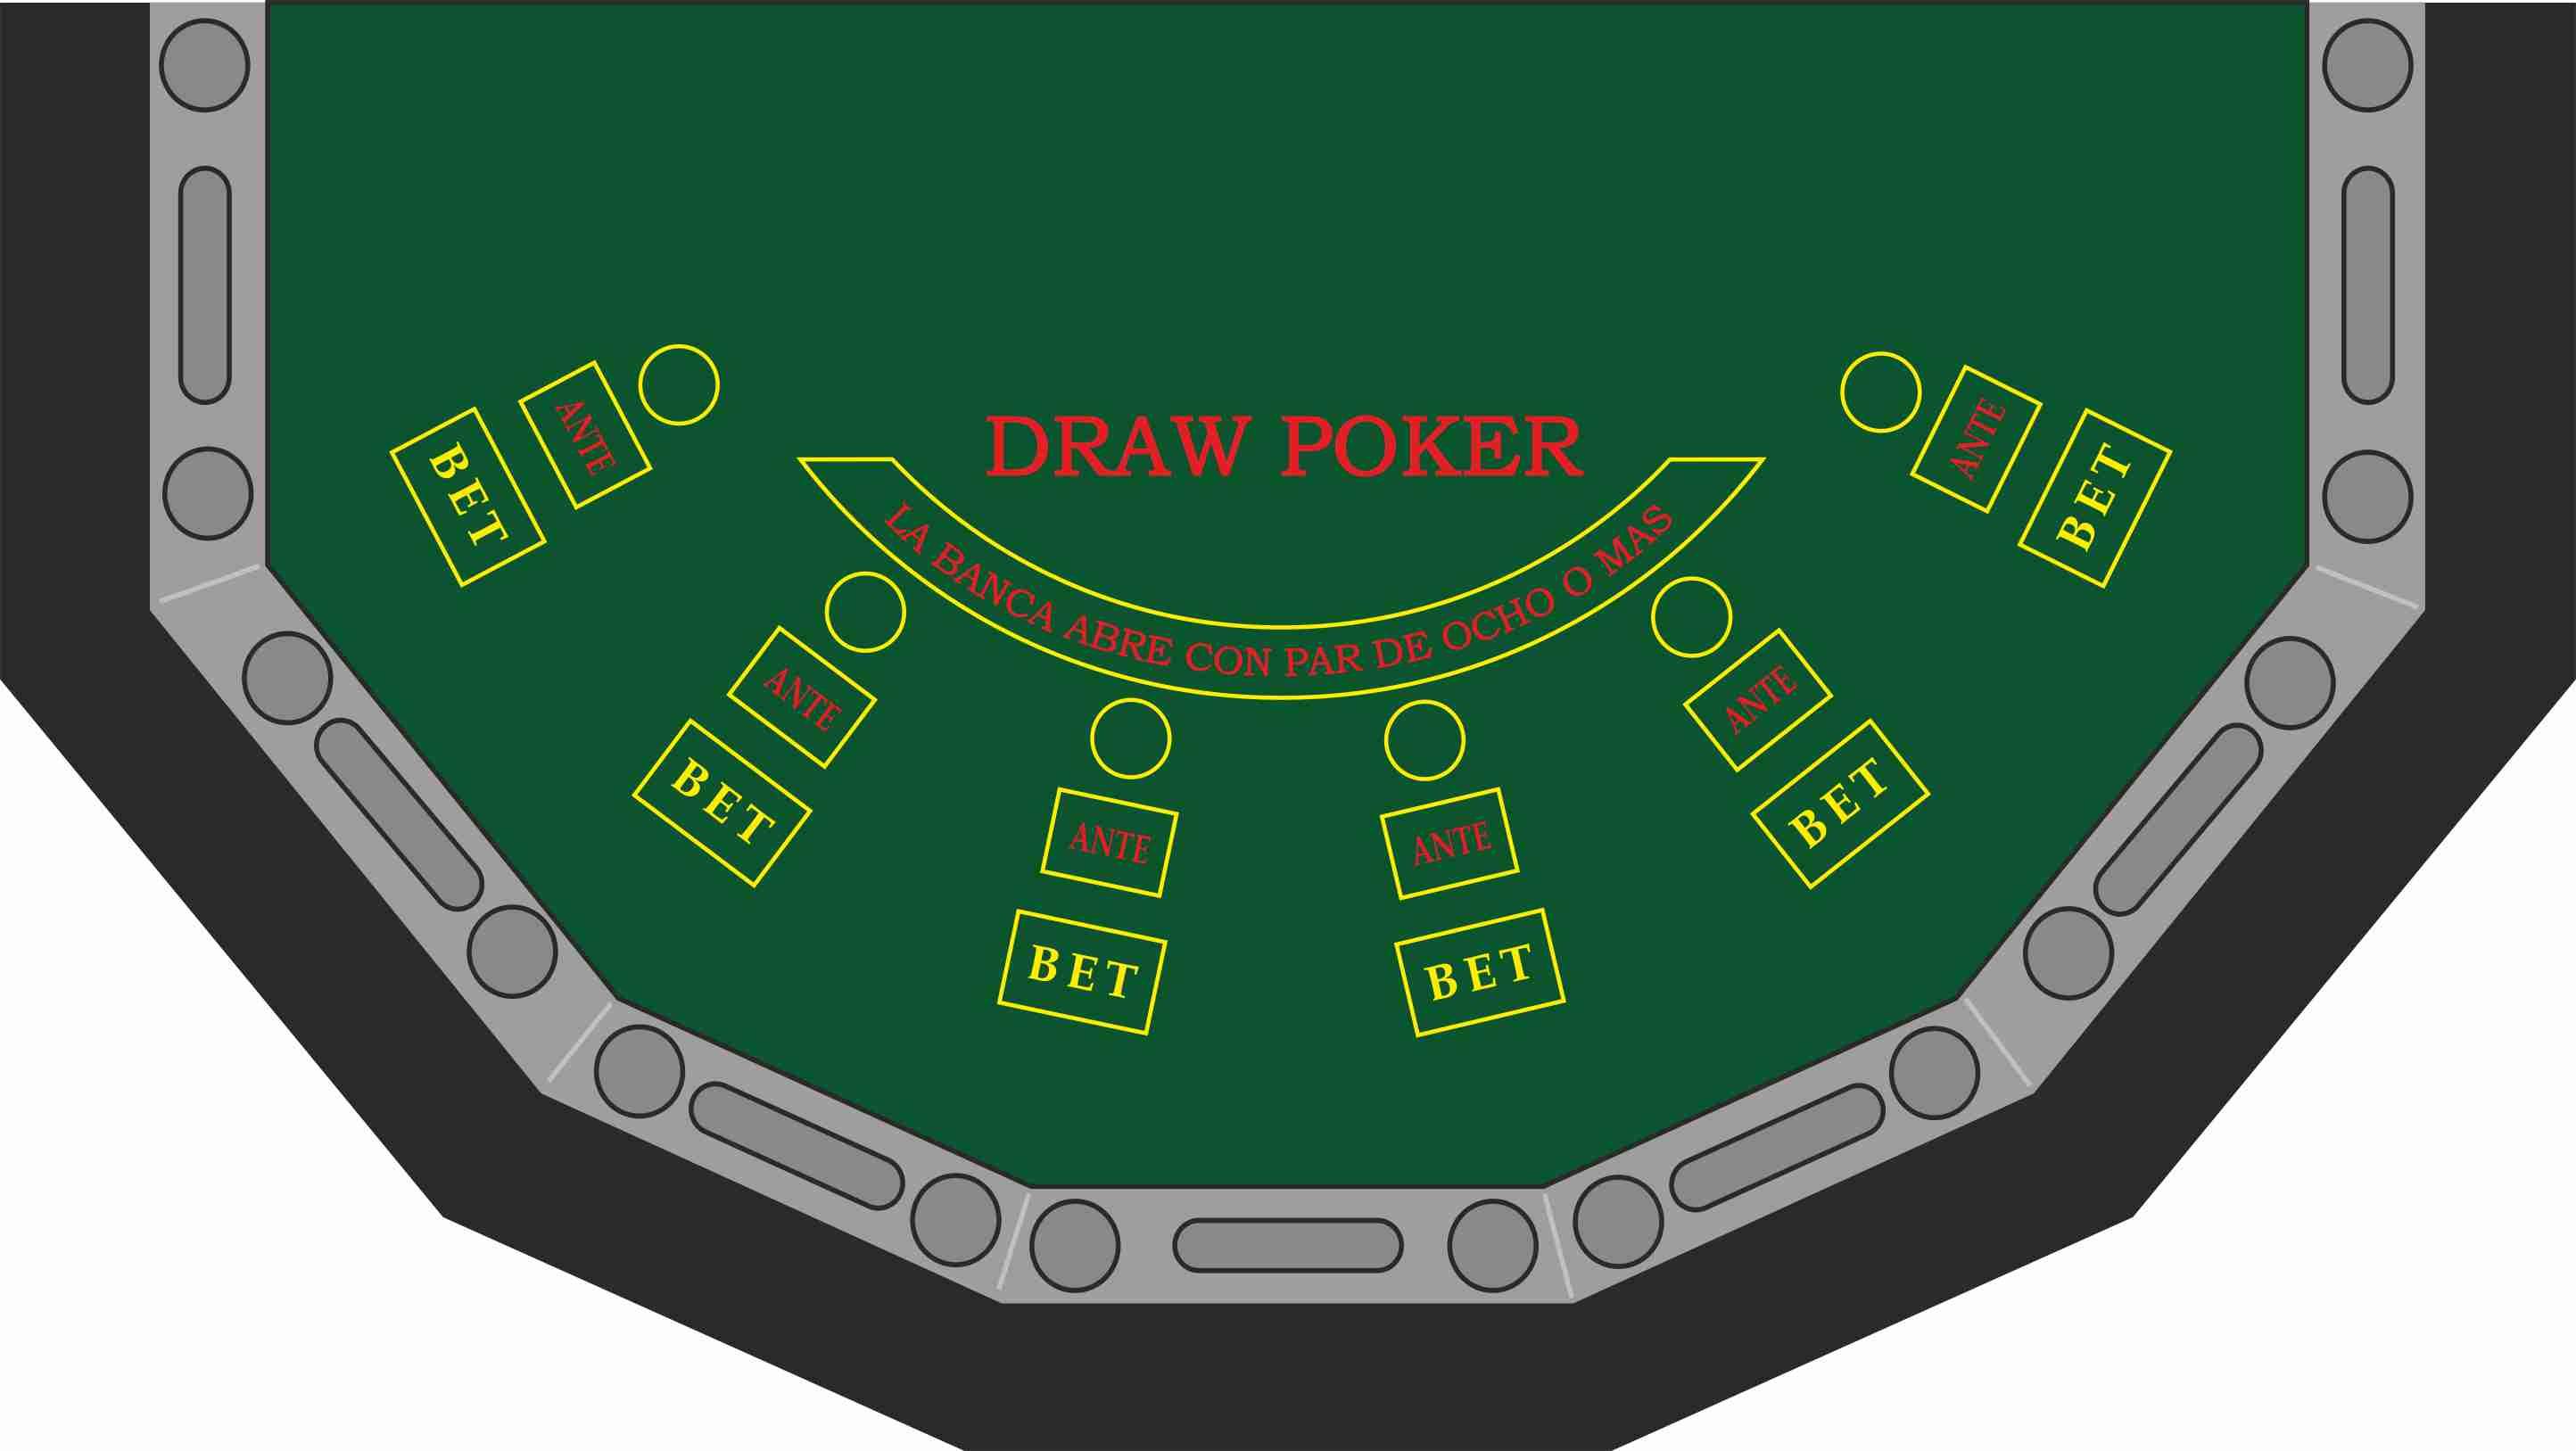 Draw Poker 6 jugadores